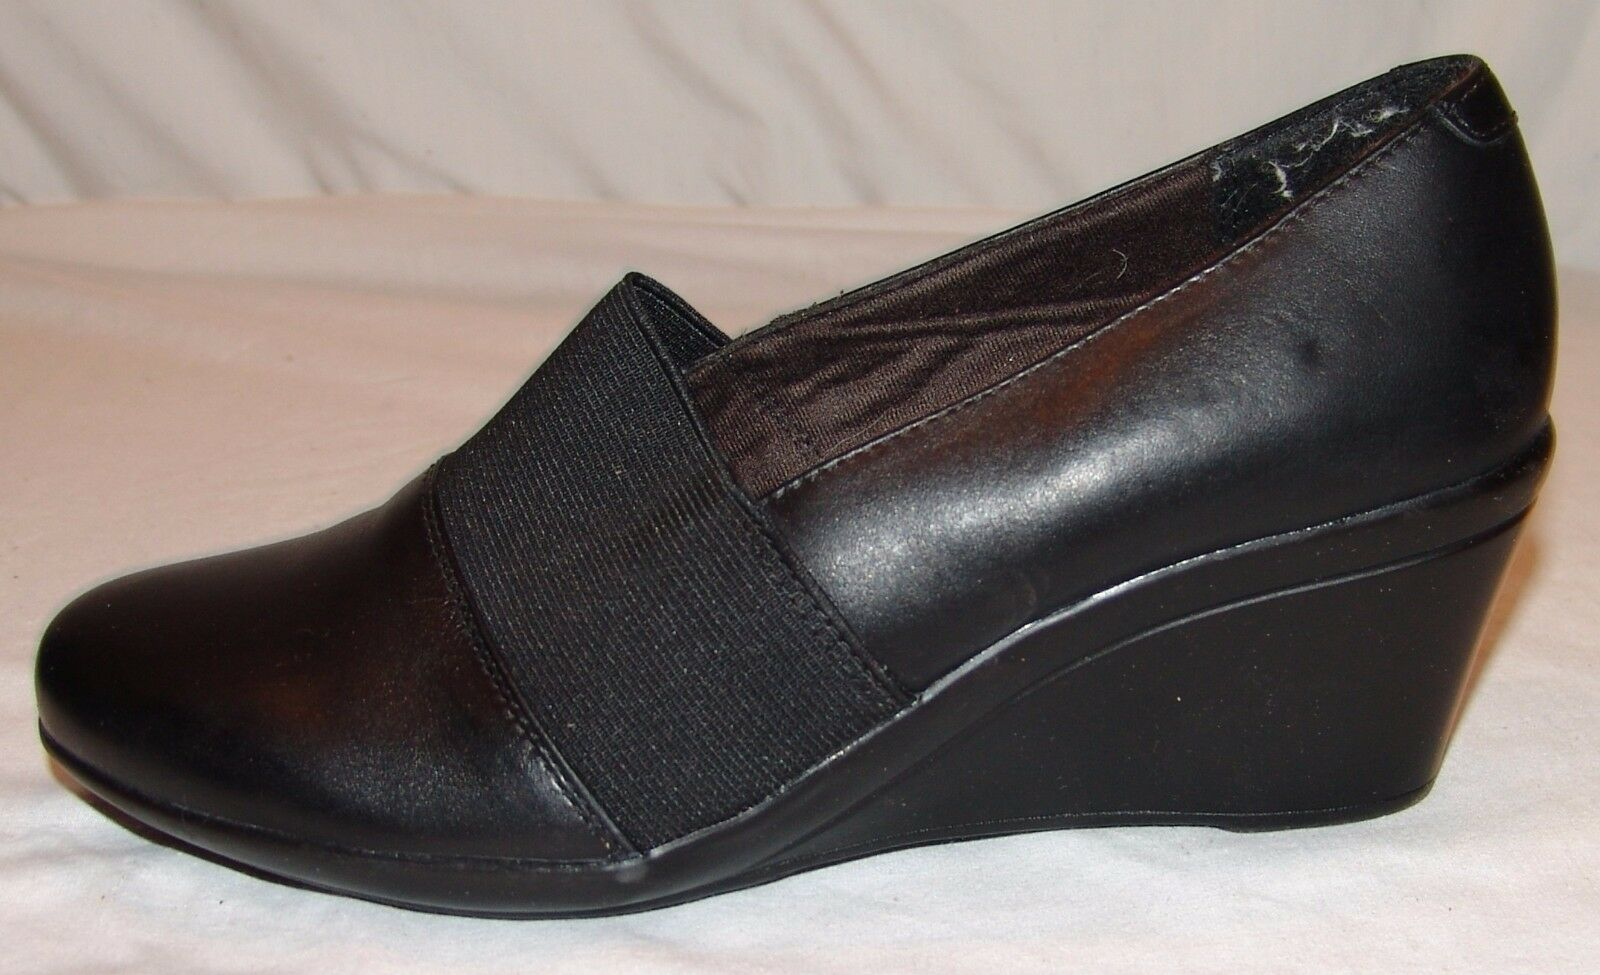 Clarks Bendables Keilabsatz Schuhe 7M 7 M Damen Schwarz Klassisch ohne Bügel